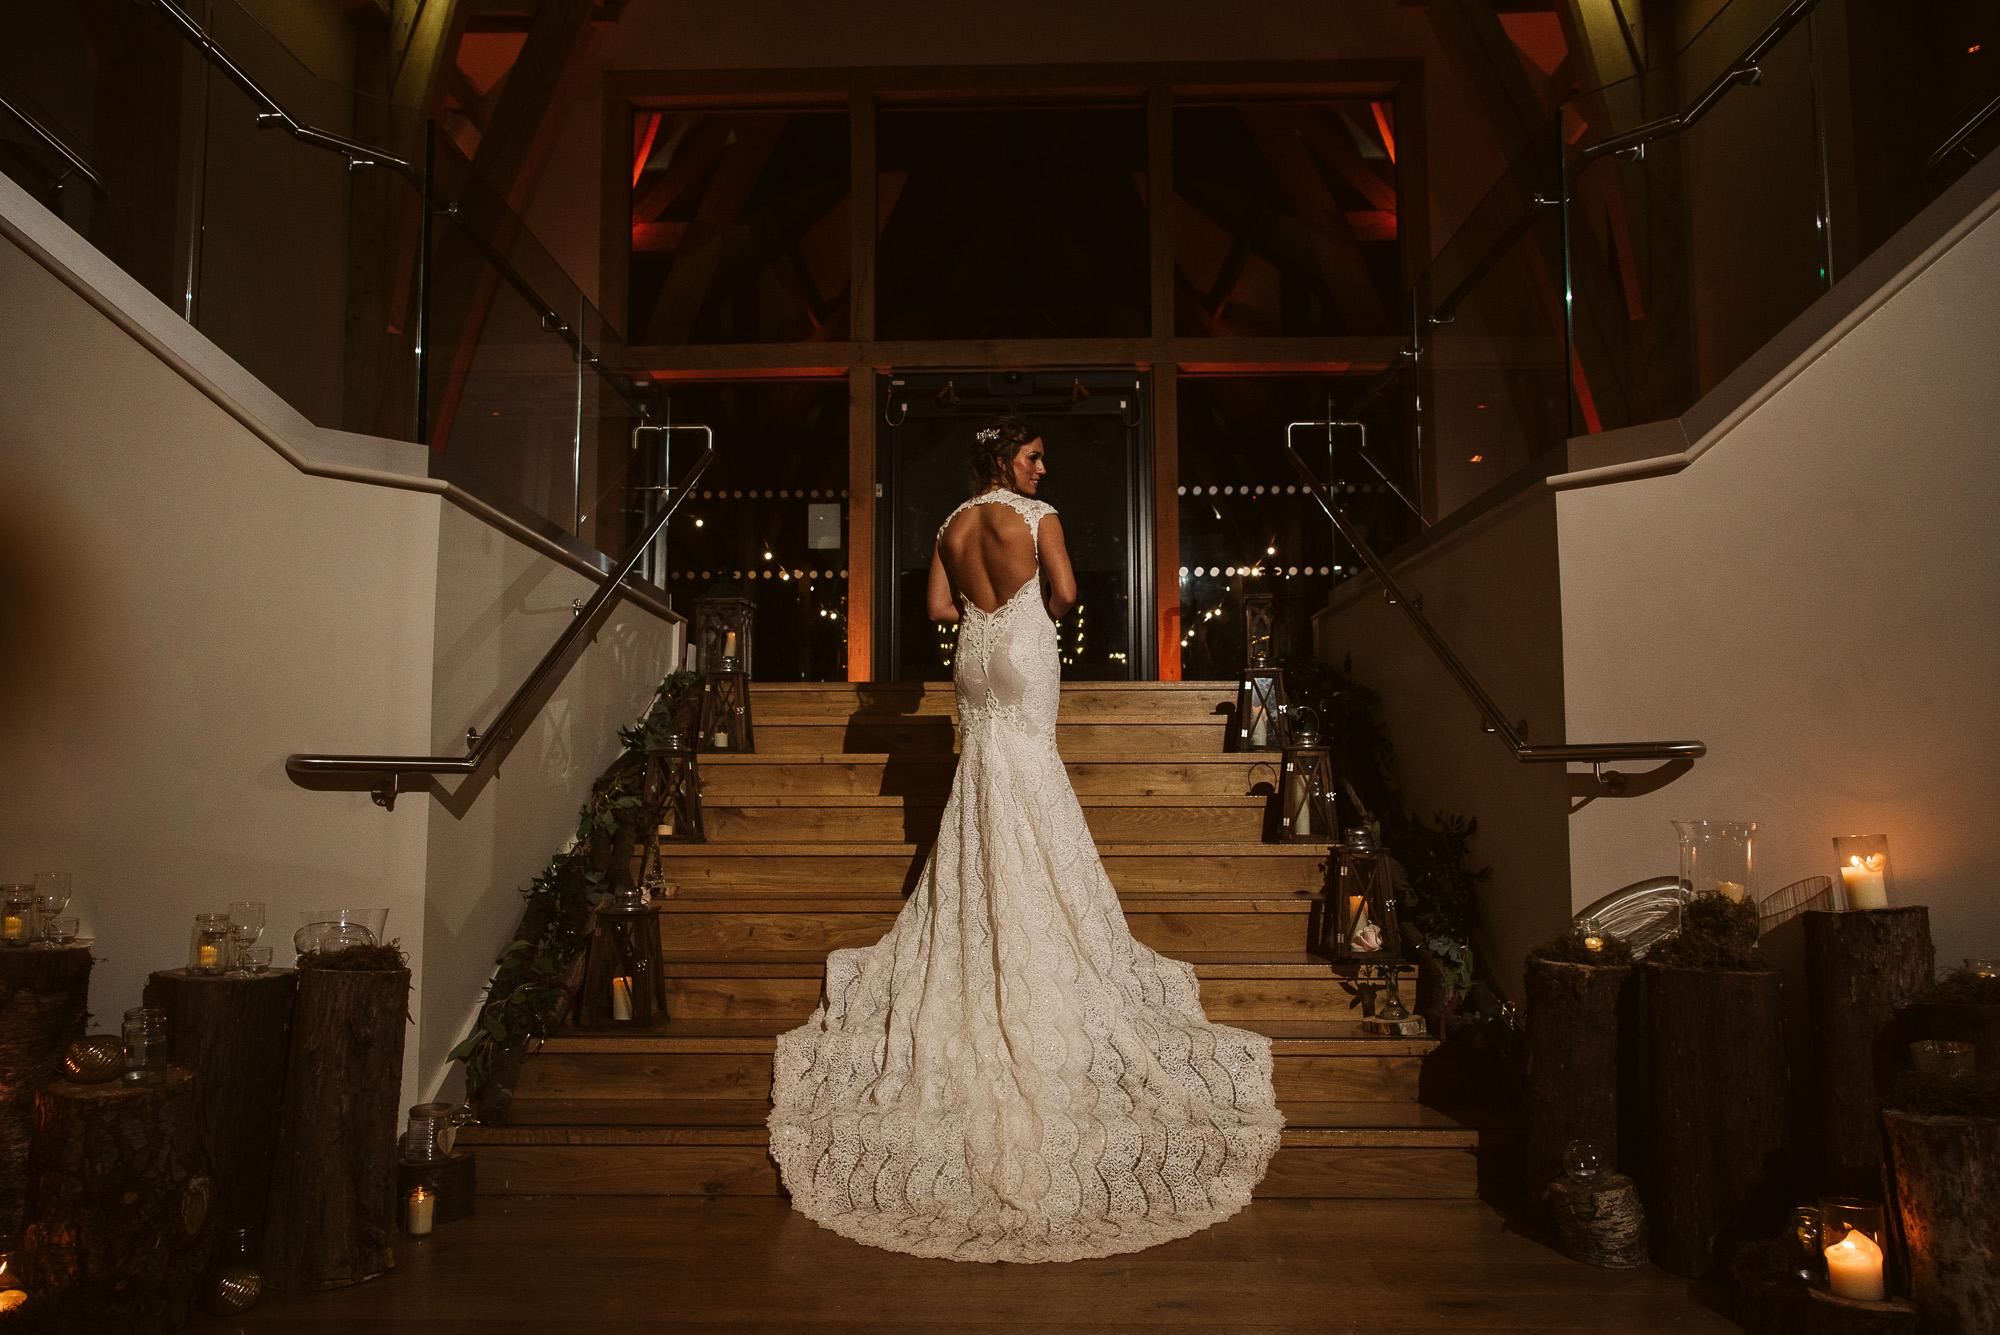 The Mill Barns Wedding Photographer Shropshire (37 of 40).jpg